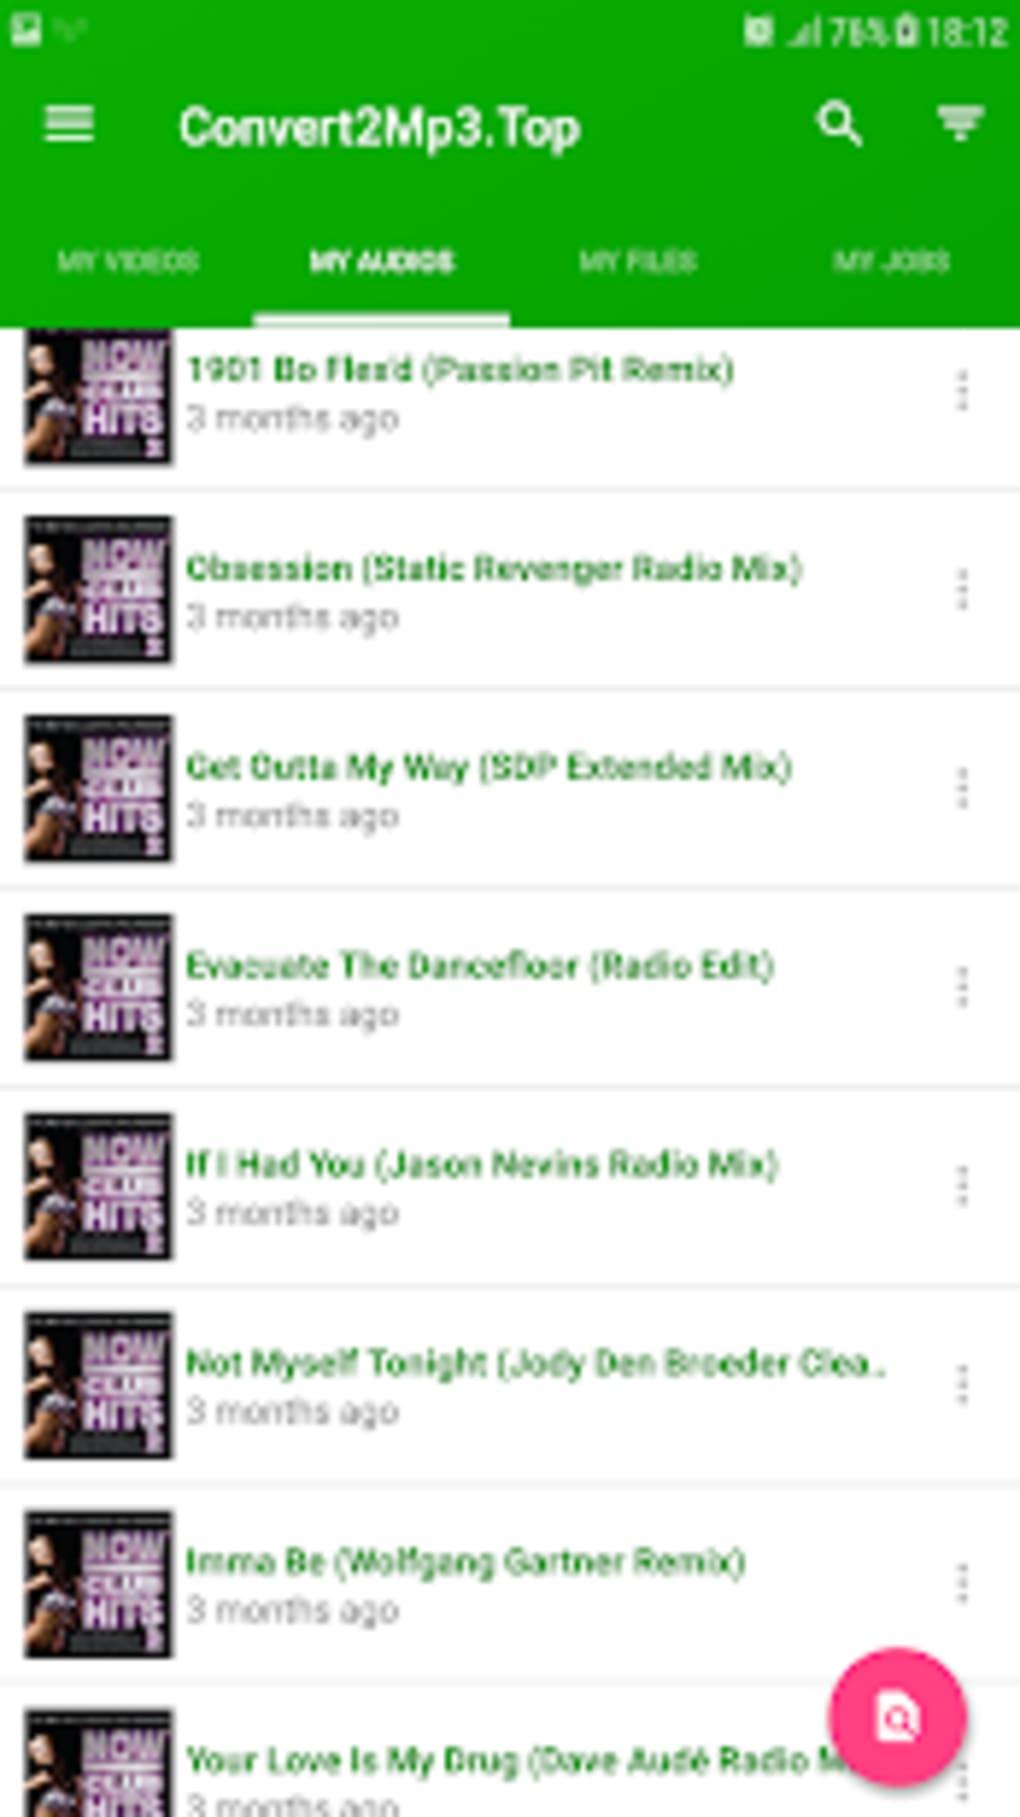 convert2mp3 kostenlos downloaden